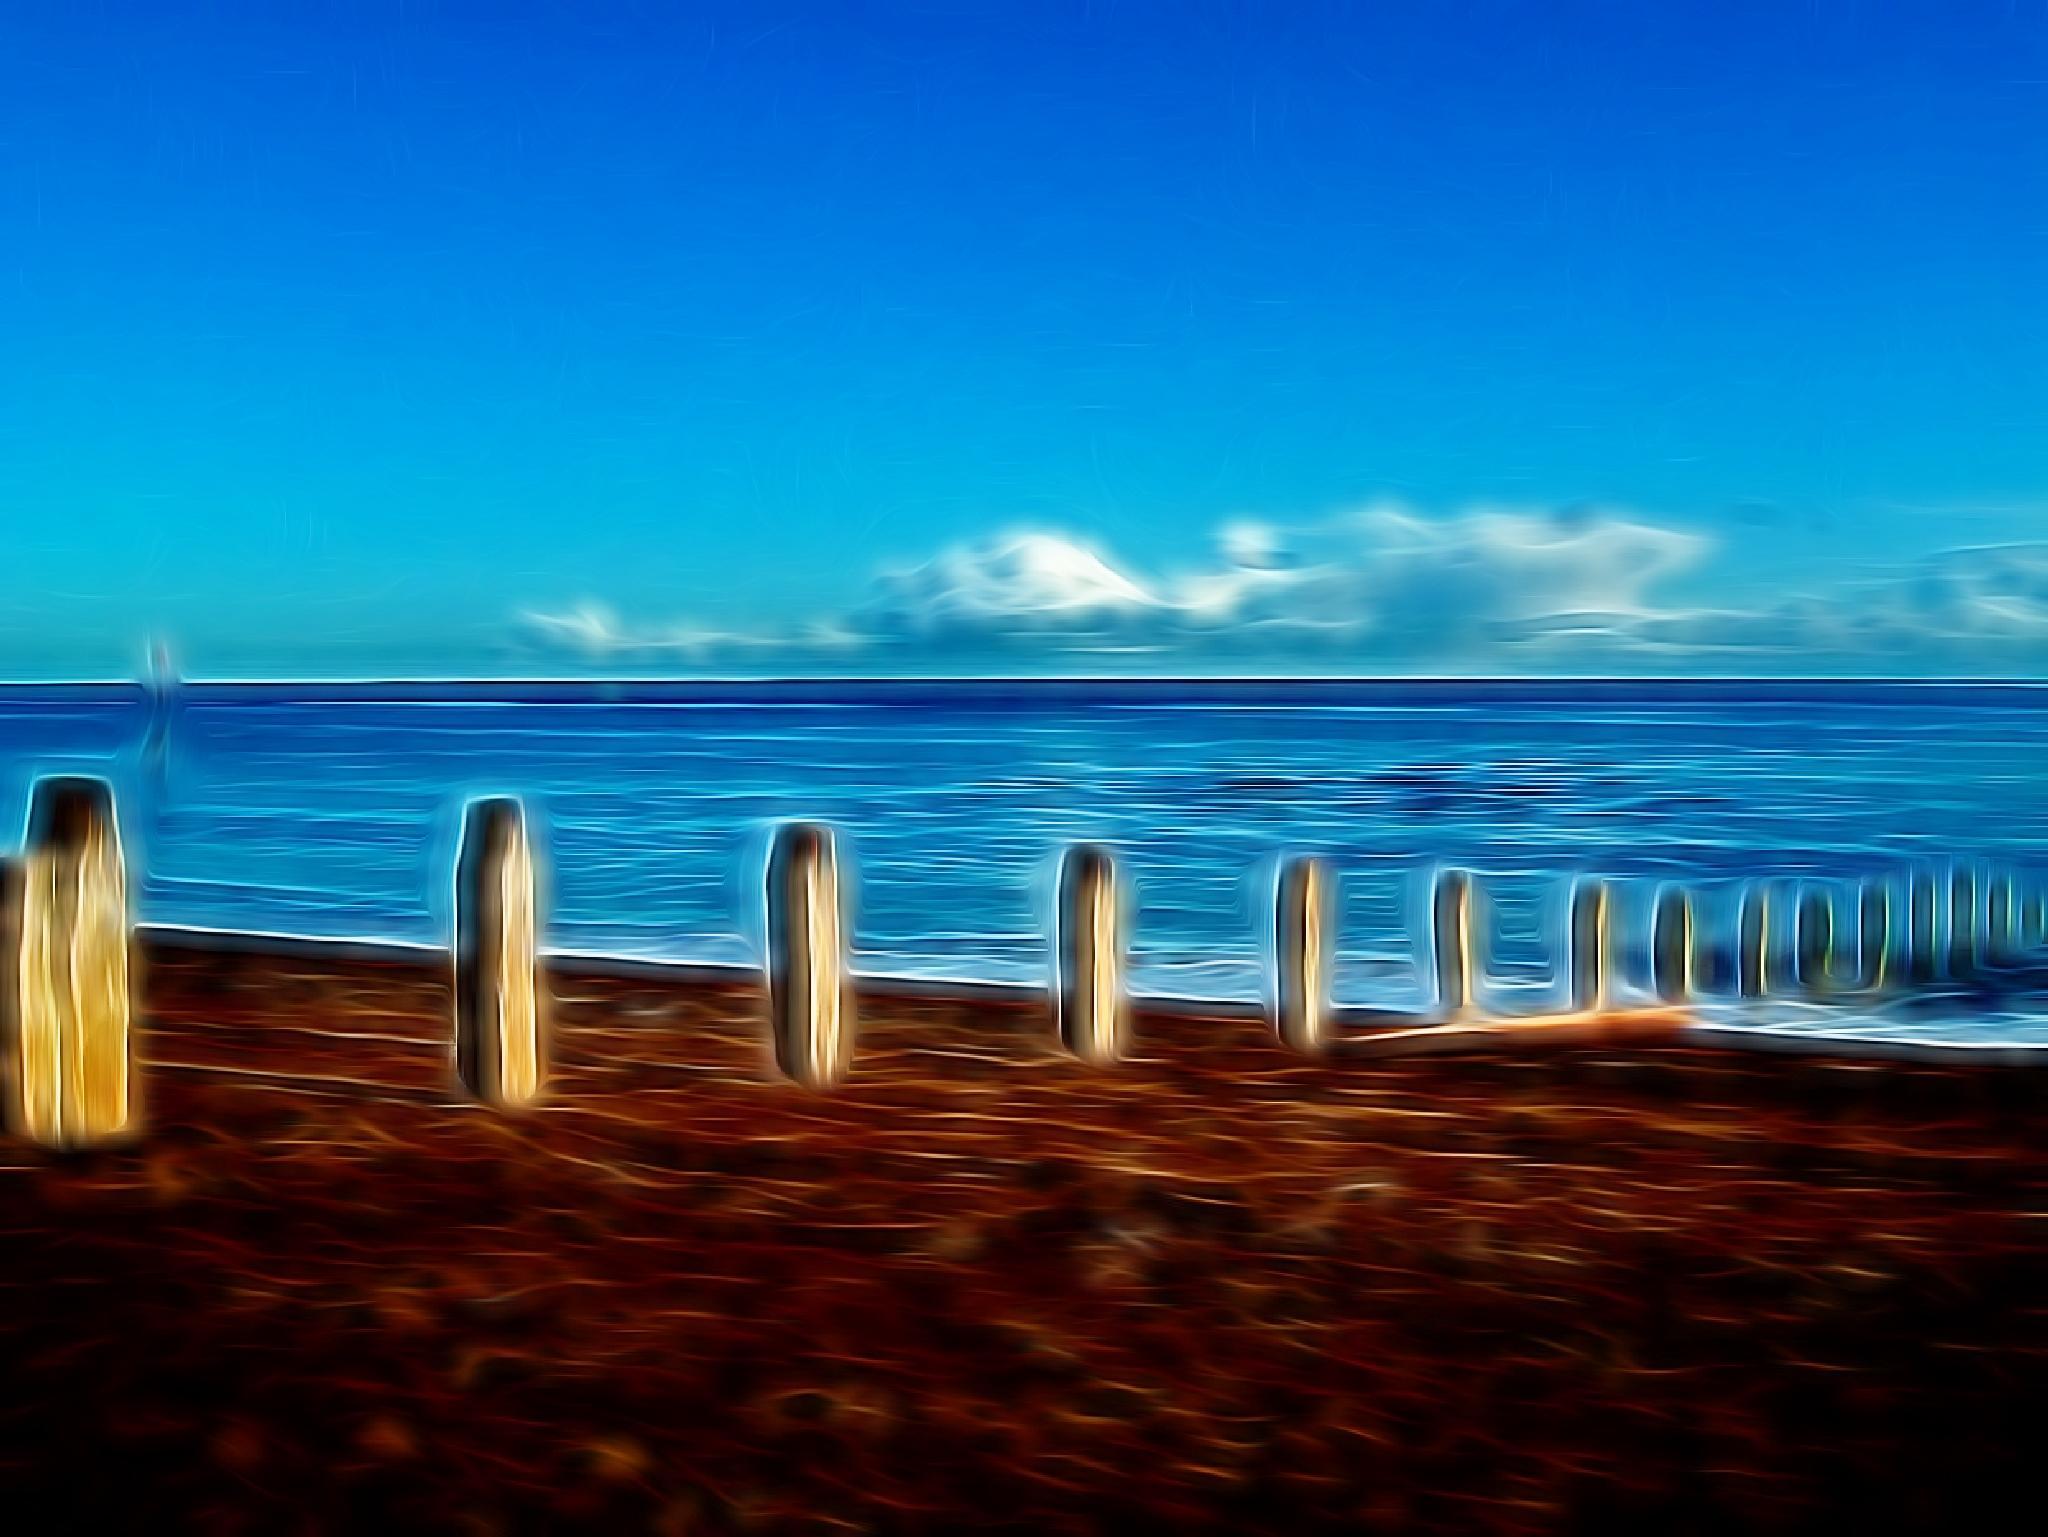 Beach Posts by stephen.harding.735